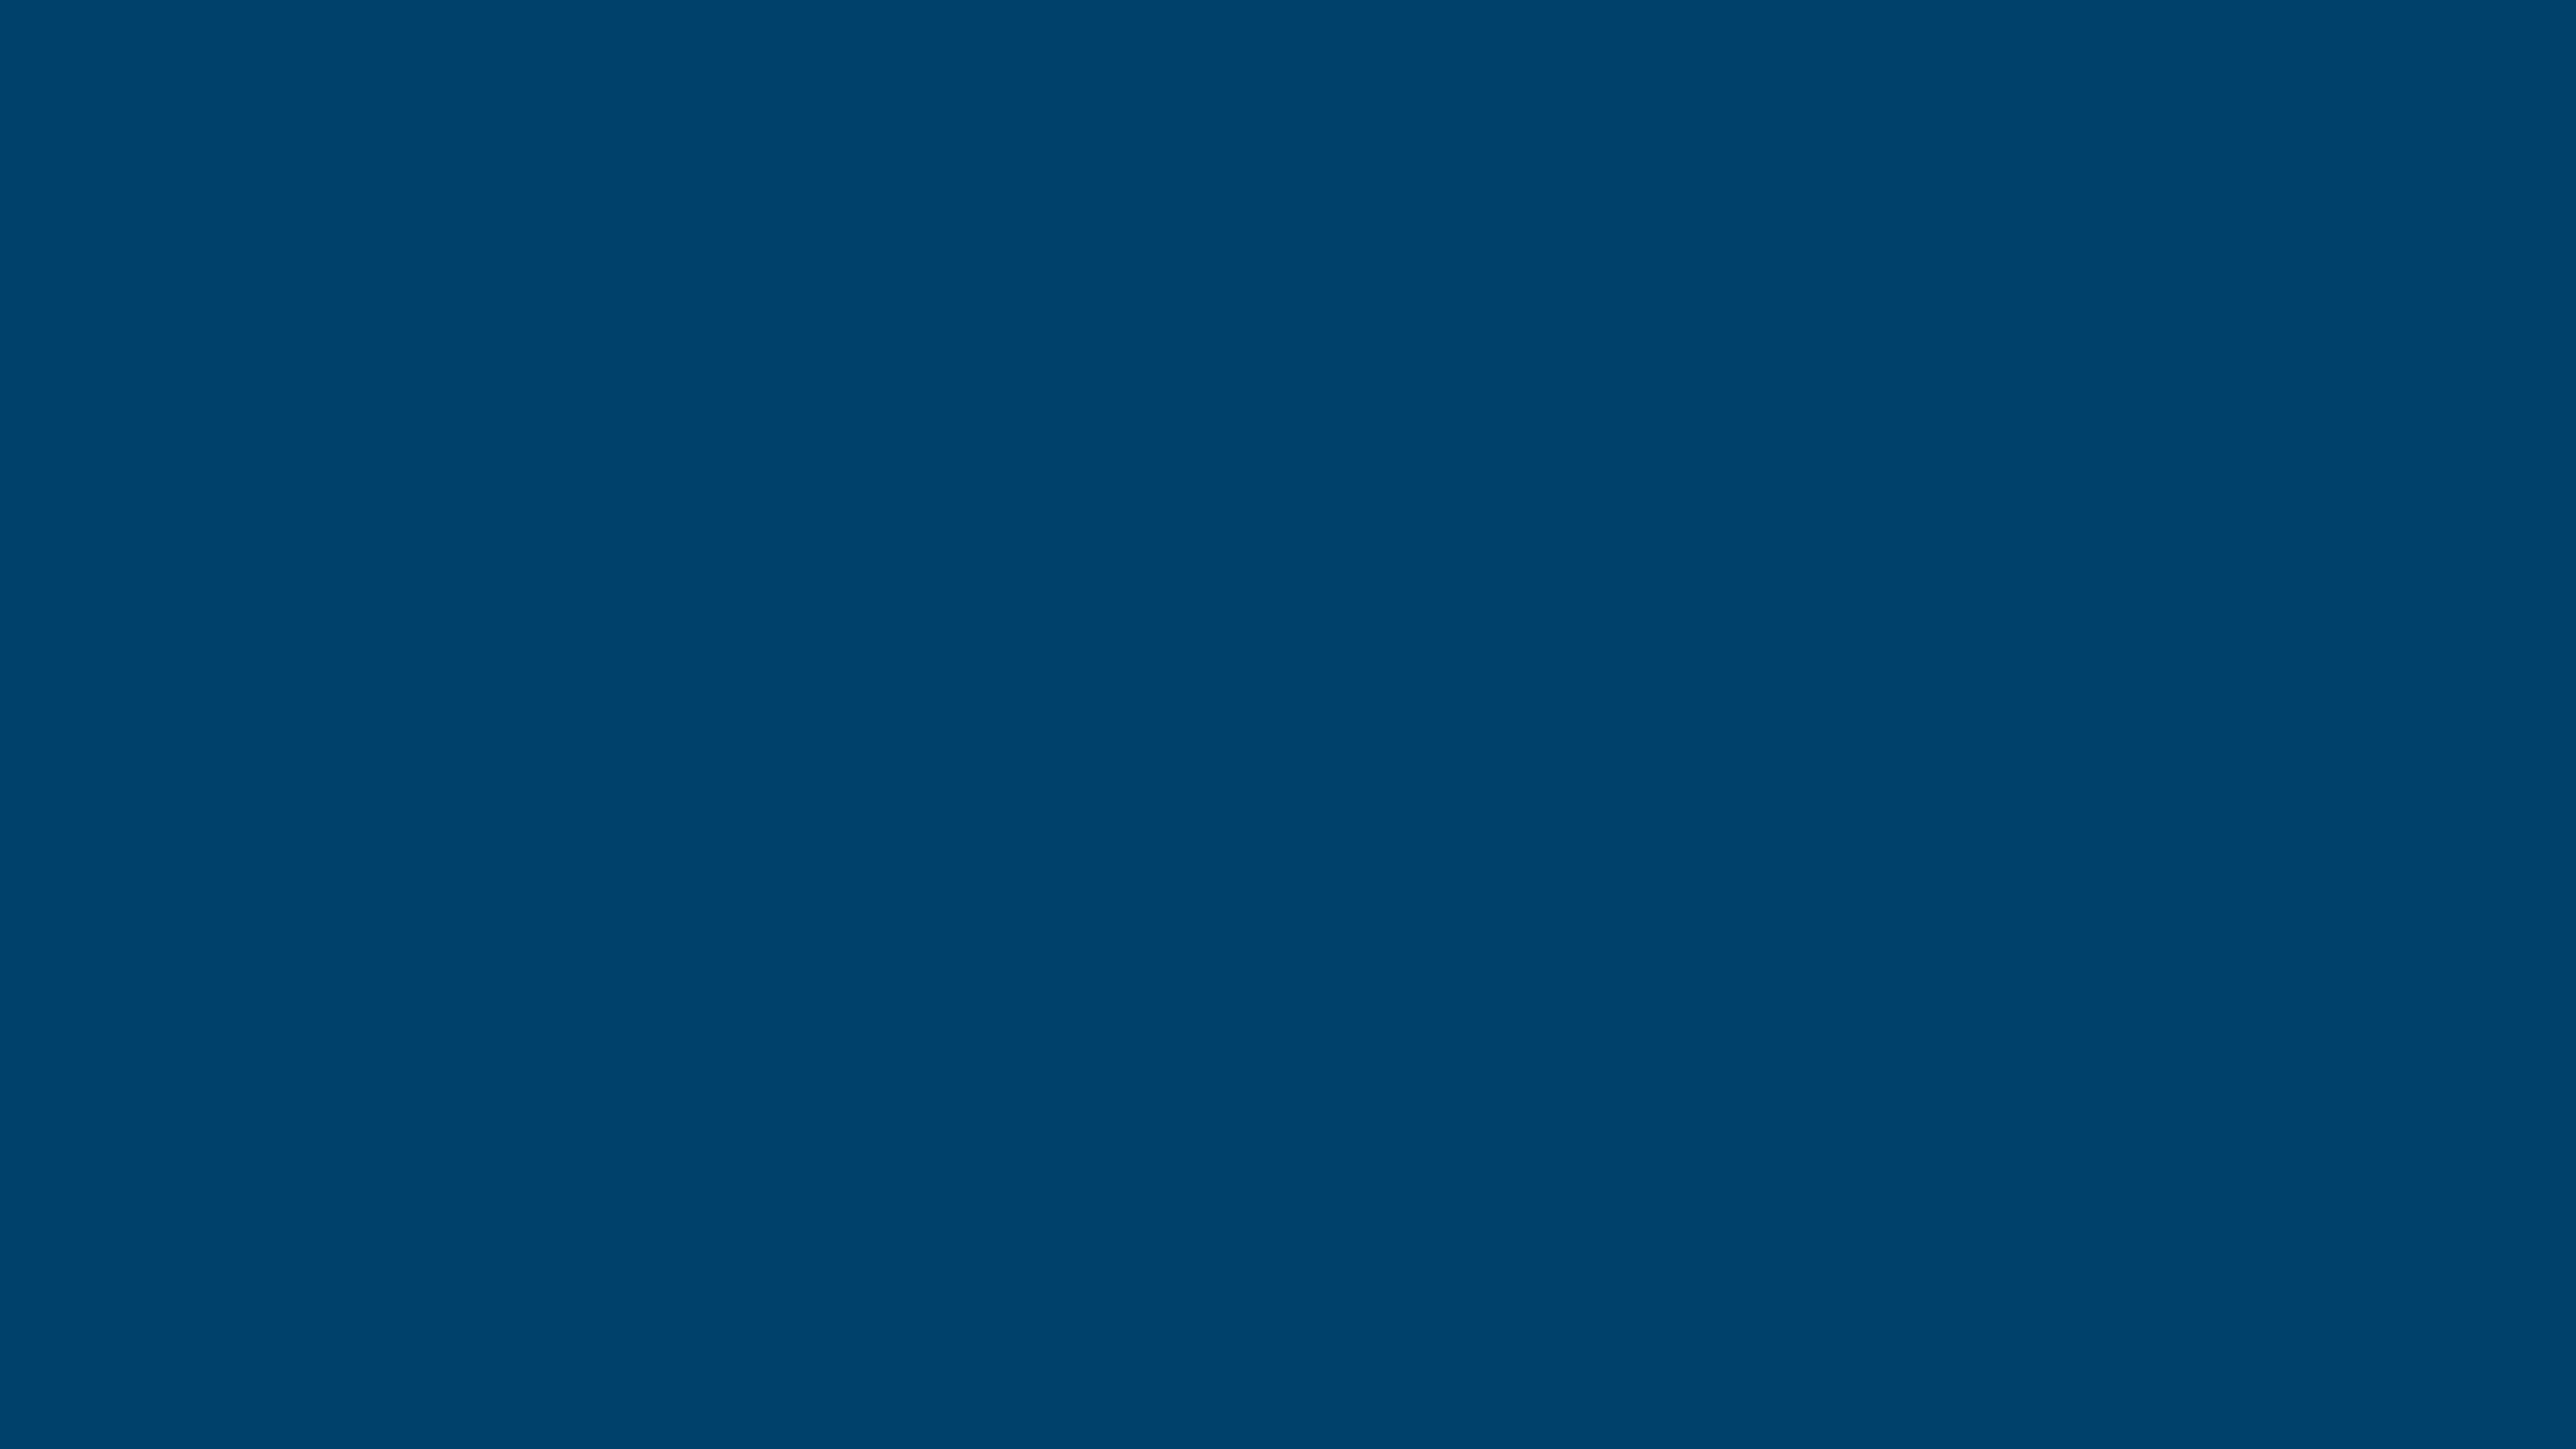 3840x2160 Indigo Dye Solid Color Background